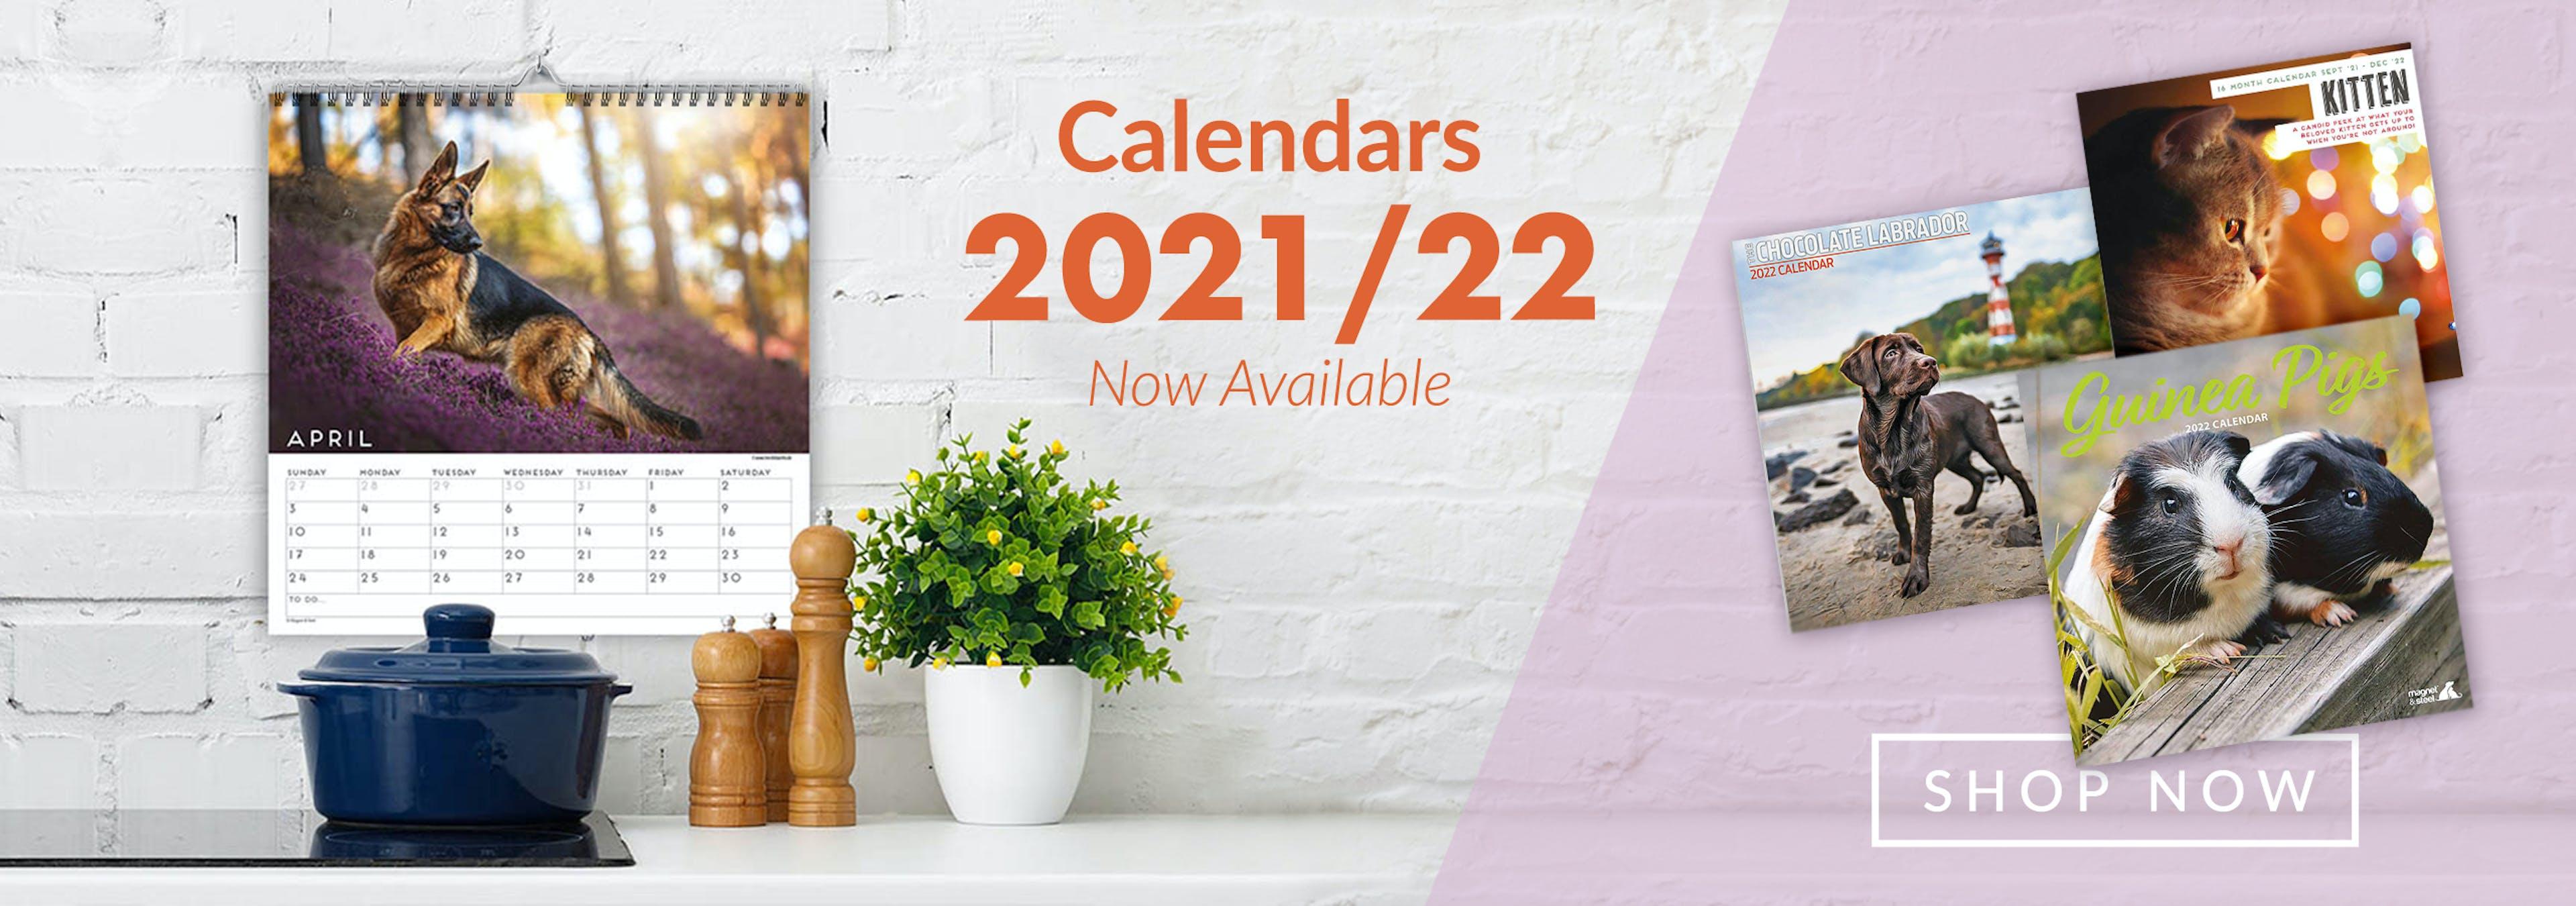 Petstop Calendars 2021-22 - Image